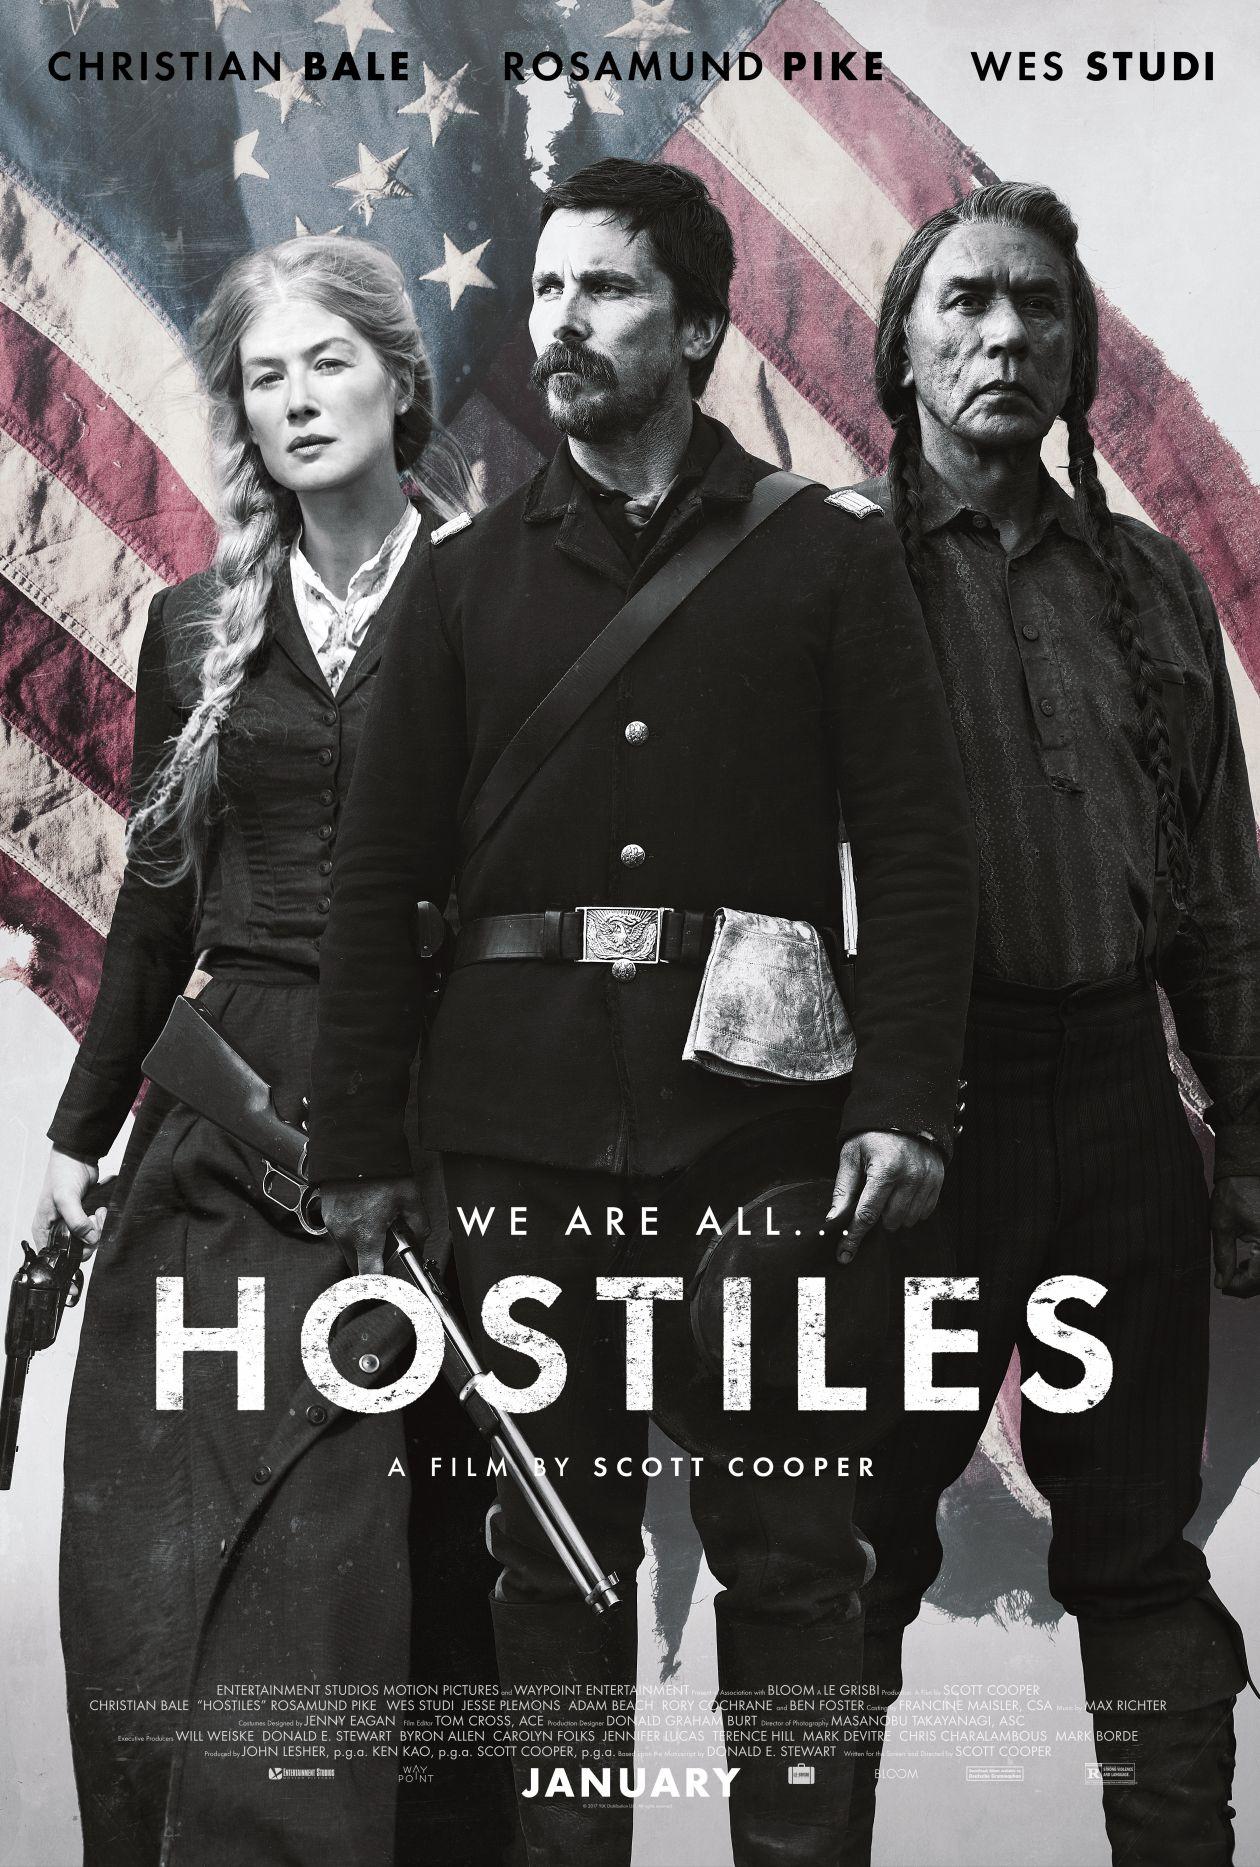 Rosamund Pike actress / Rosalie Quaid / HOSTILES / Scott Cooper 2017 Movie Poster Affiche film